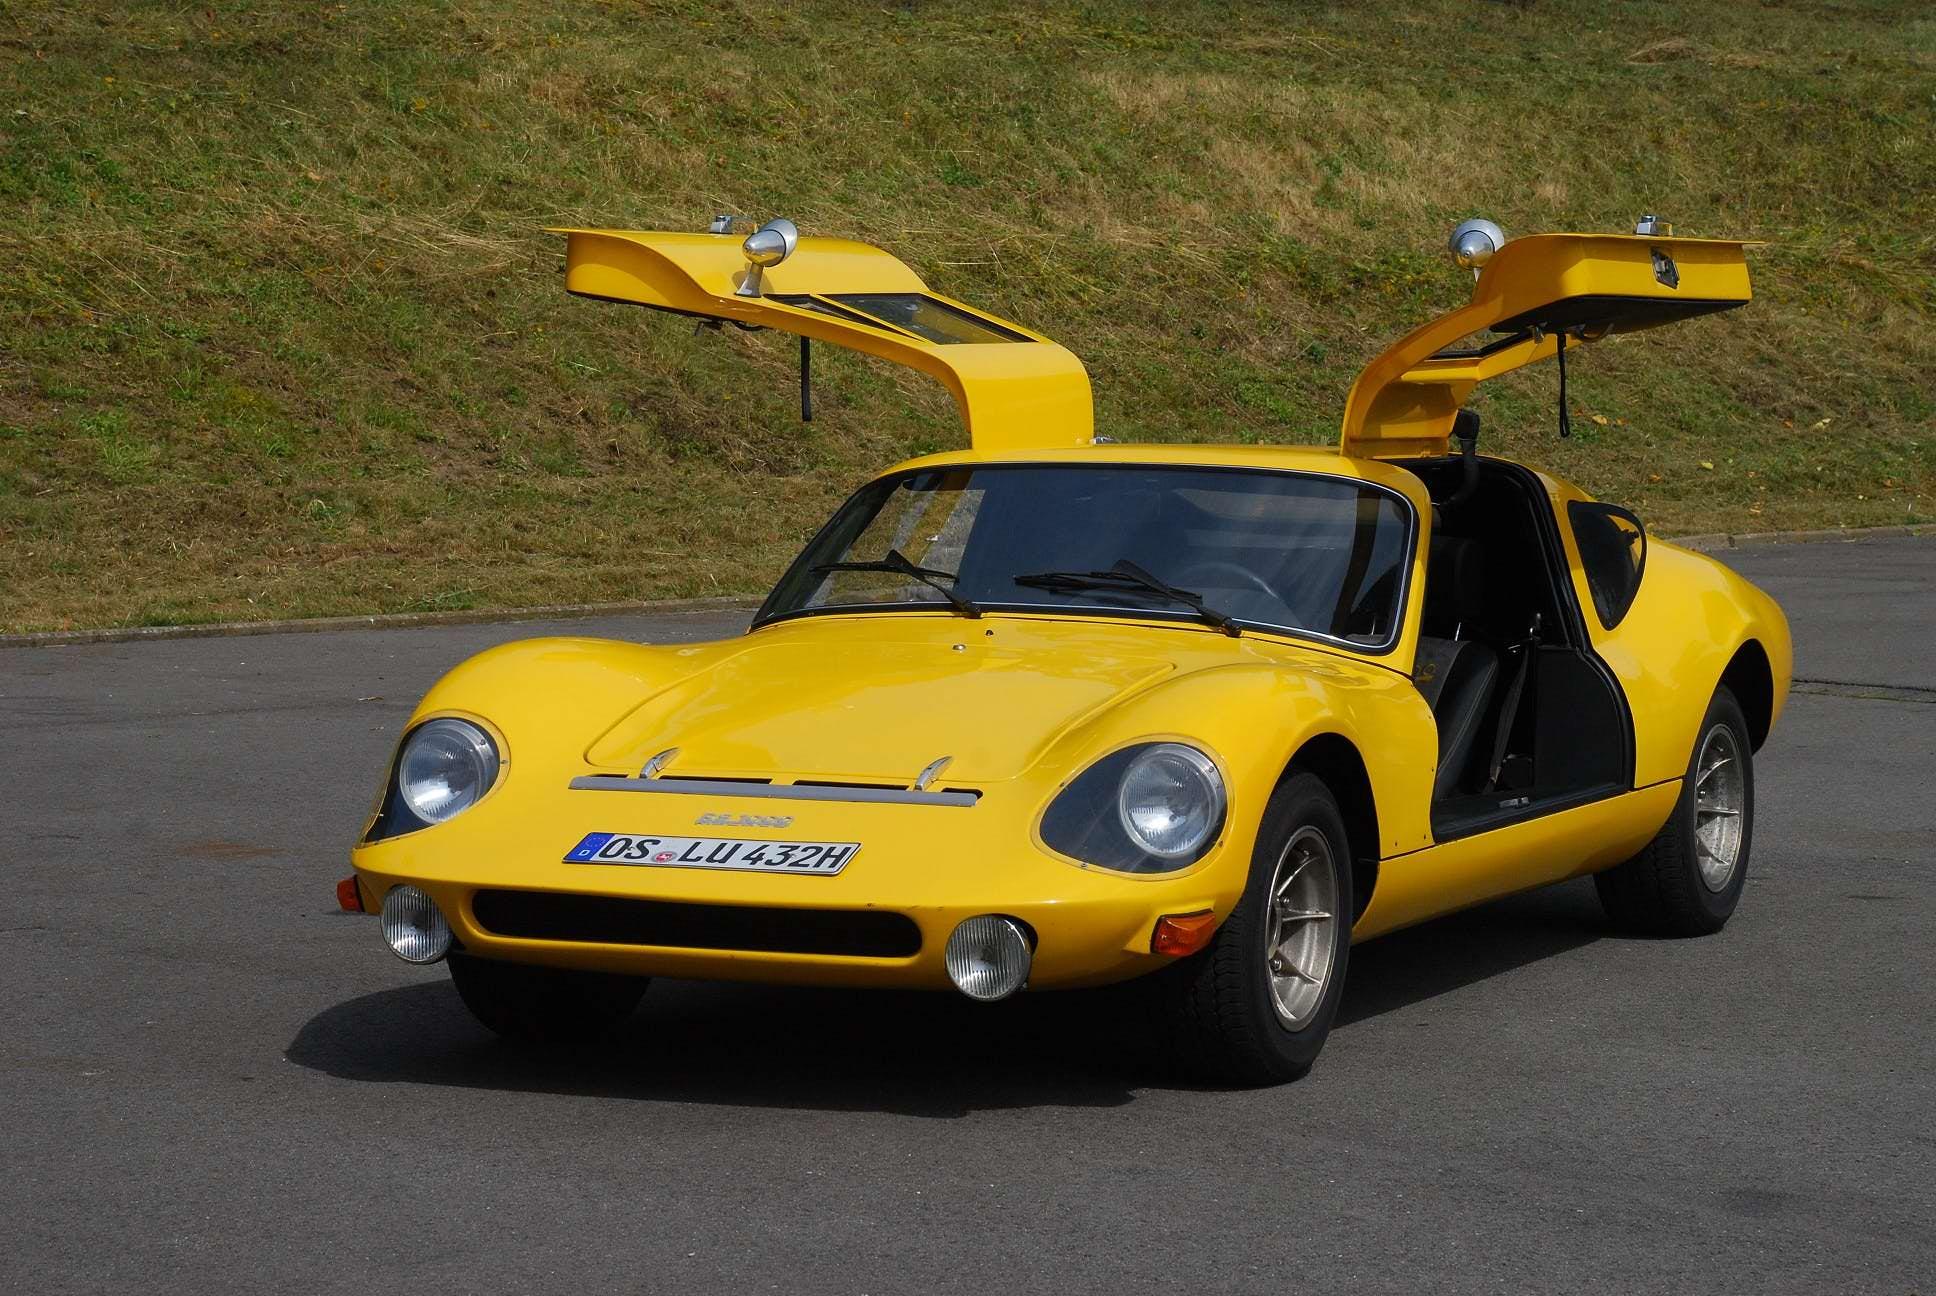 Melkus RS 1000 16